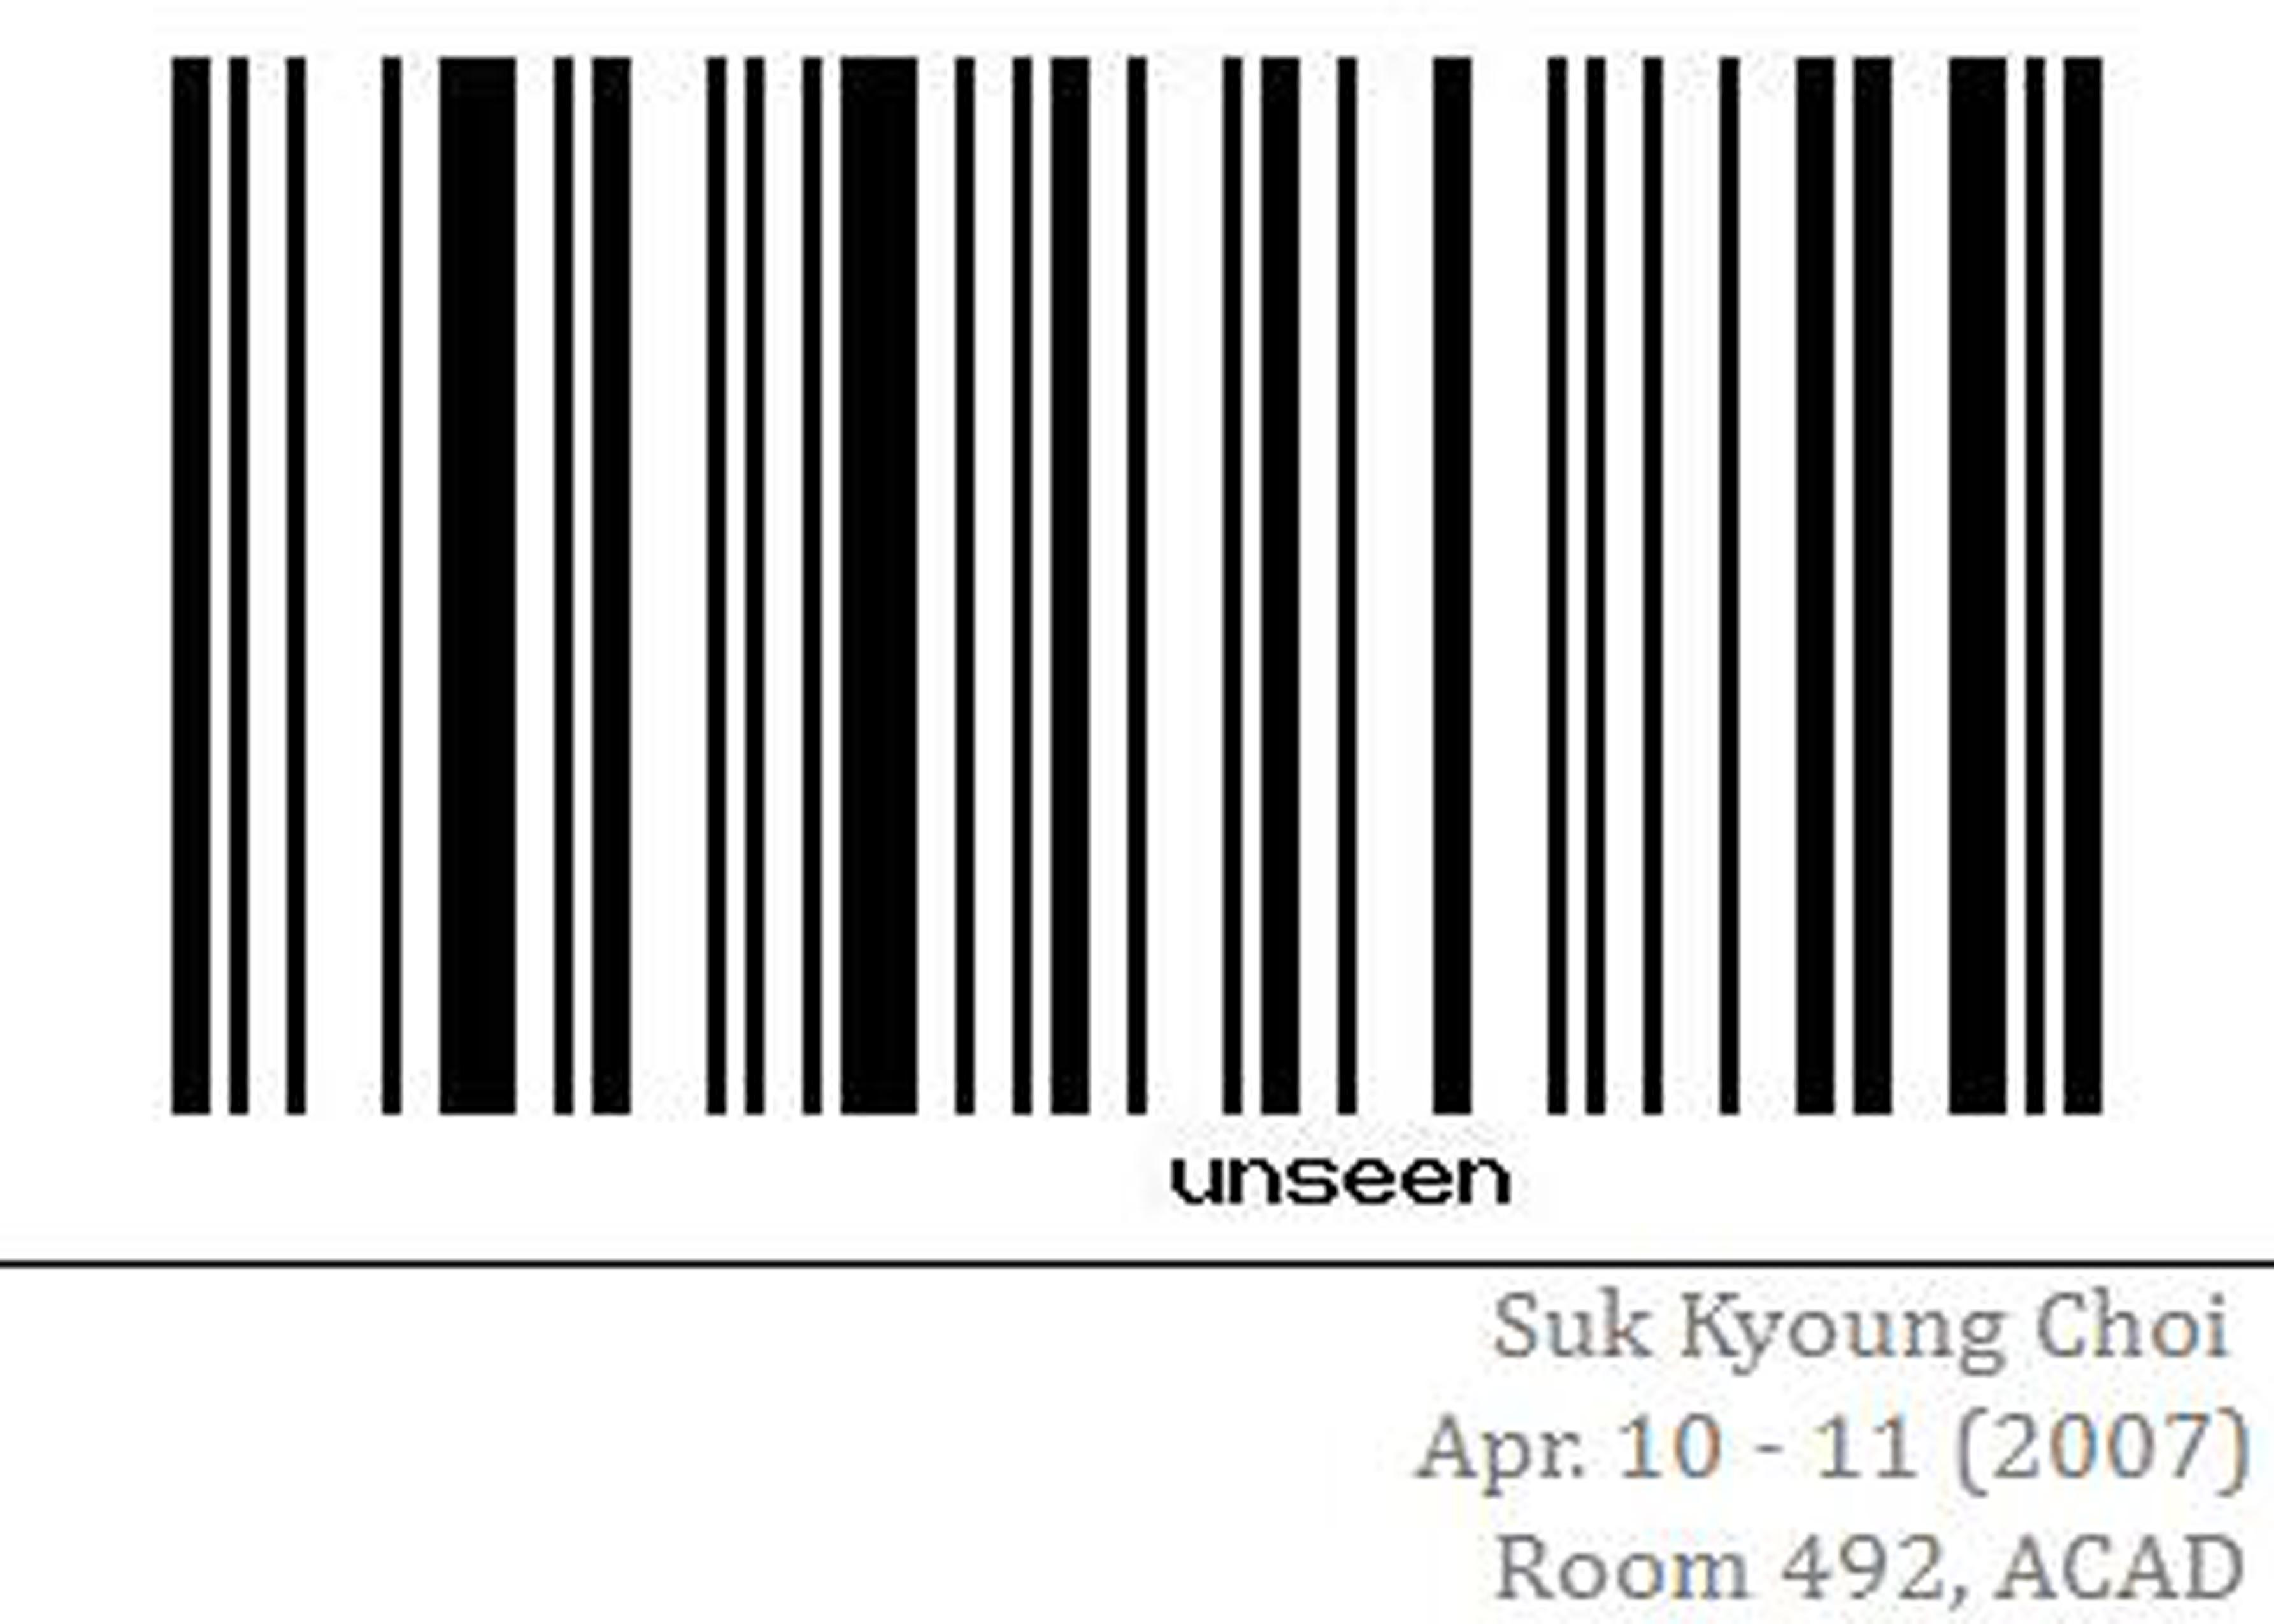 barcode image